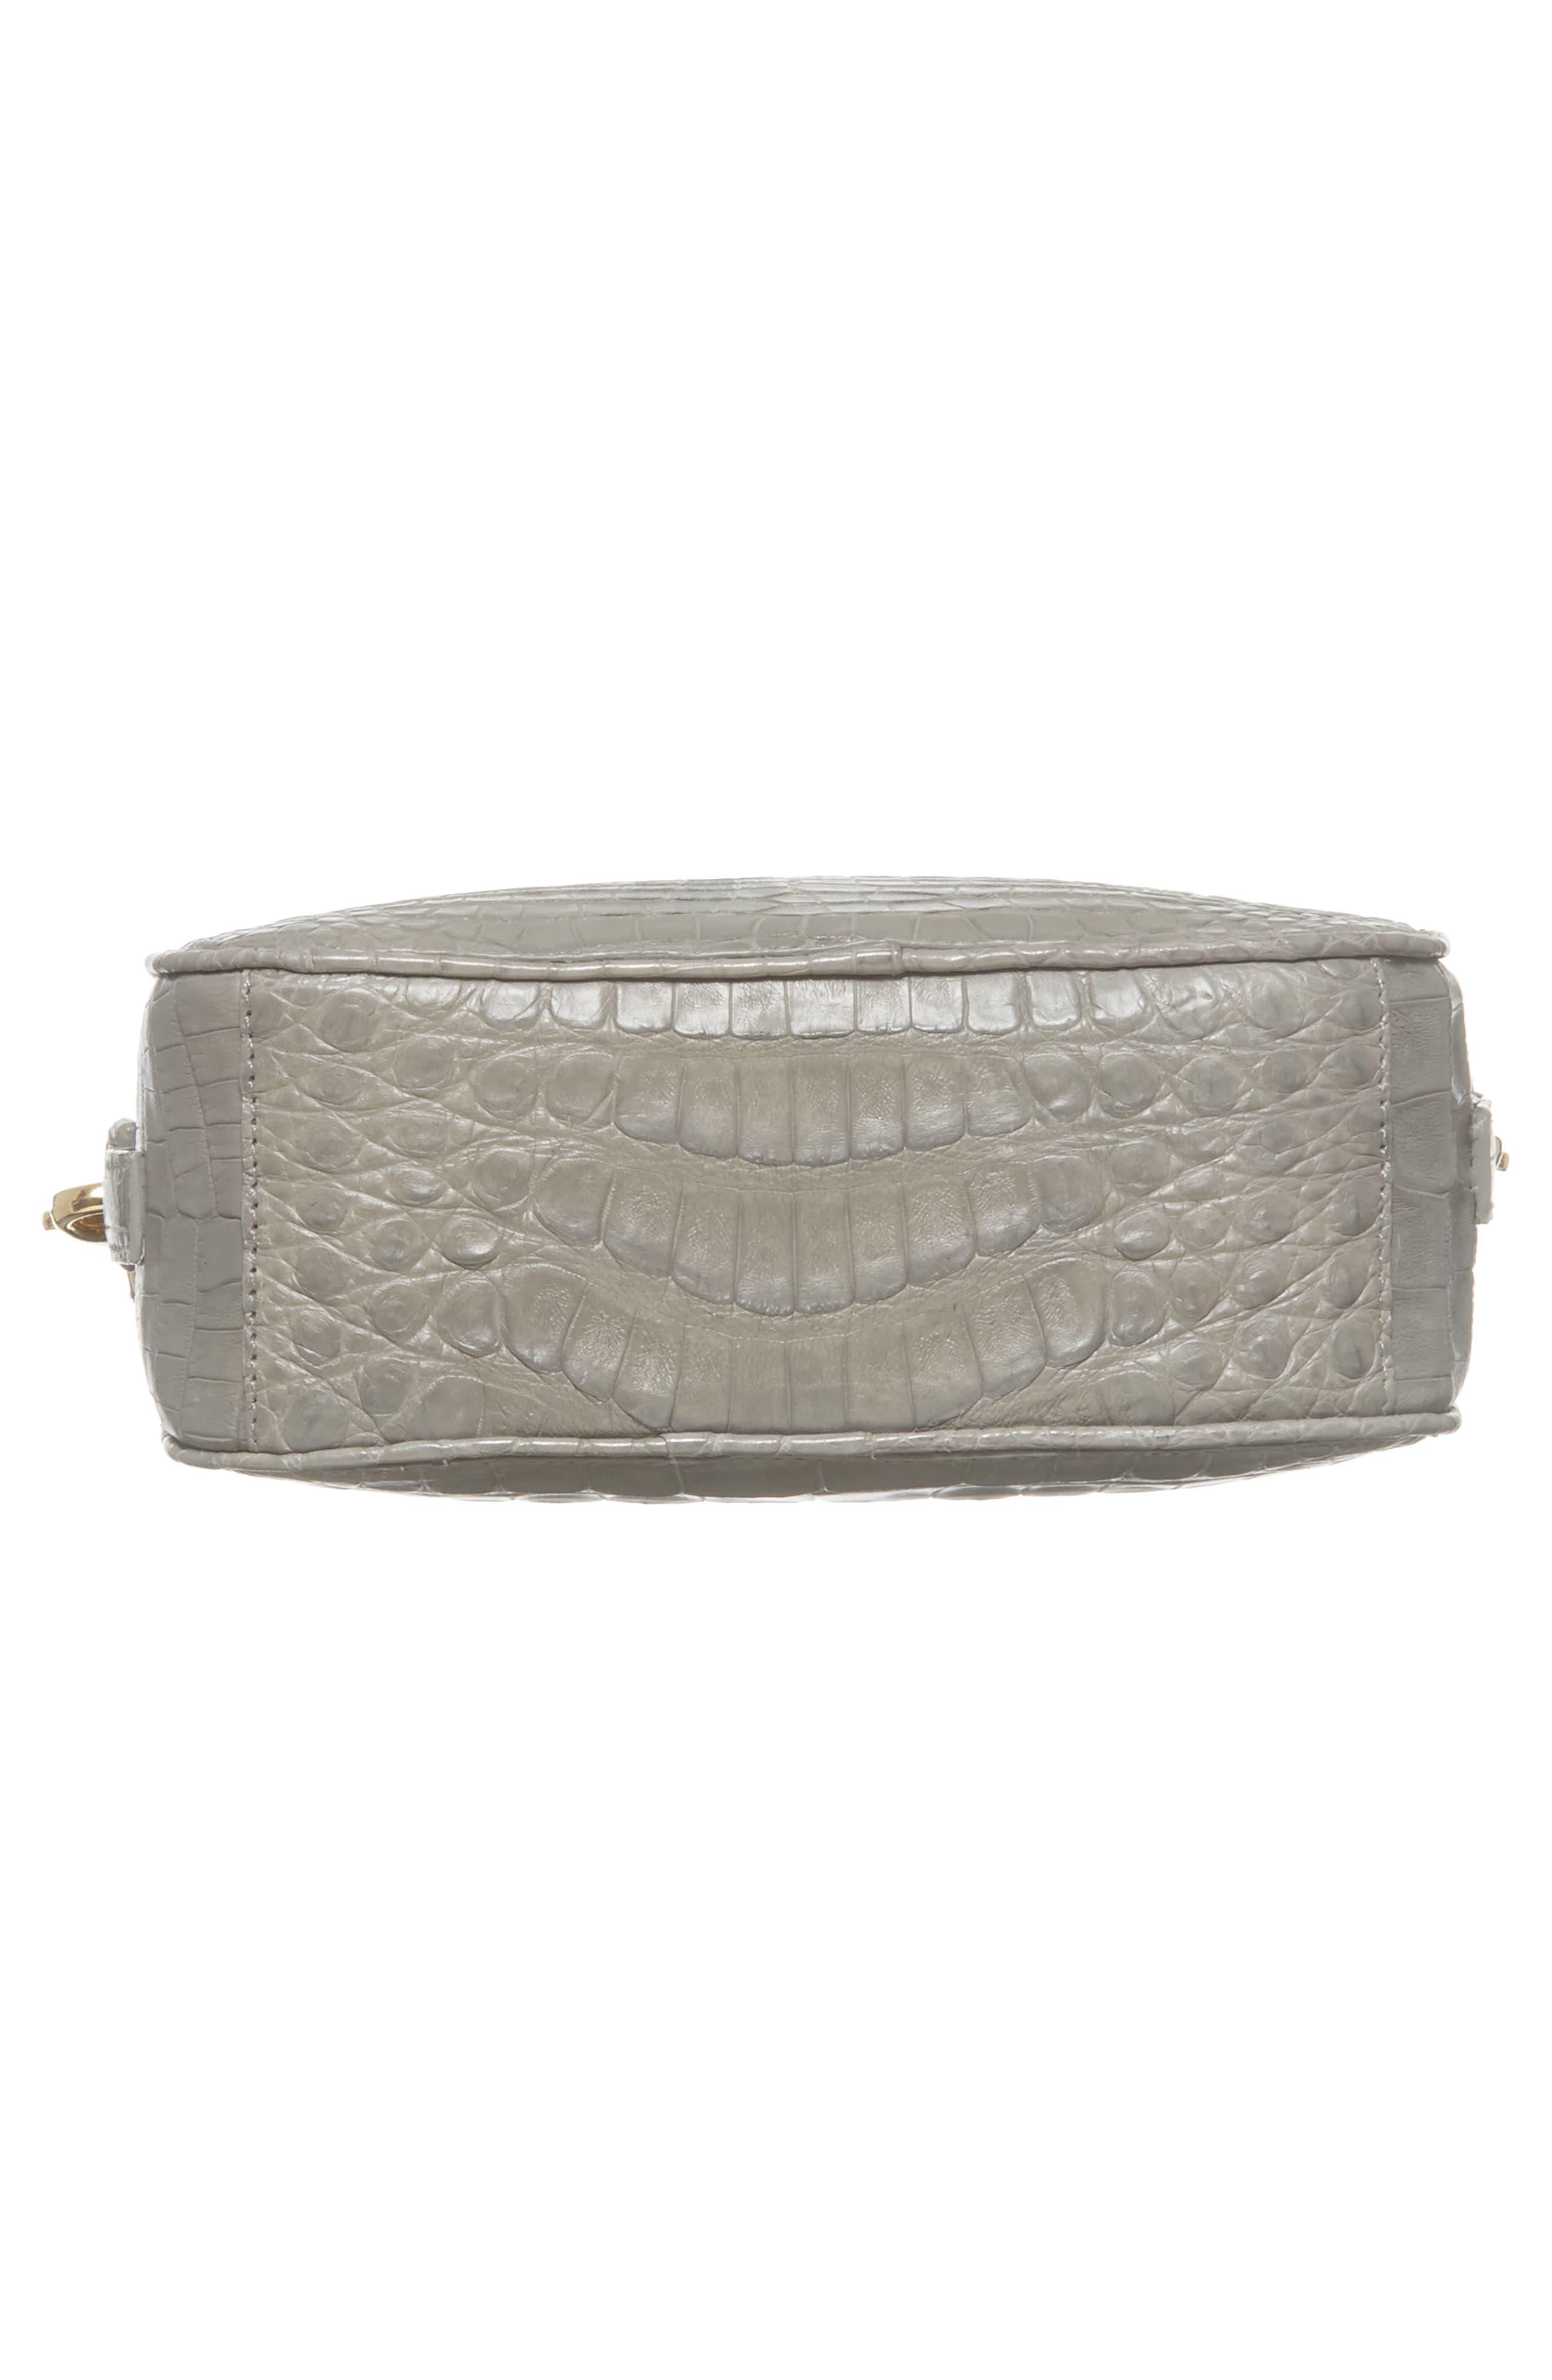 Genuine Crocodile Crossbody Bag,                             Alternate thumbnail 6, color,                             020